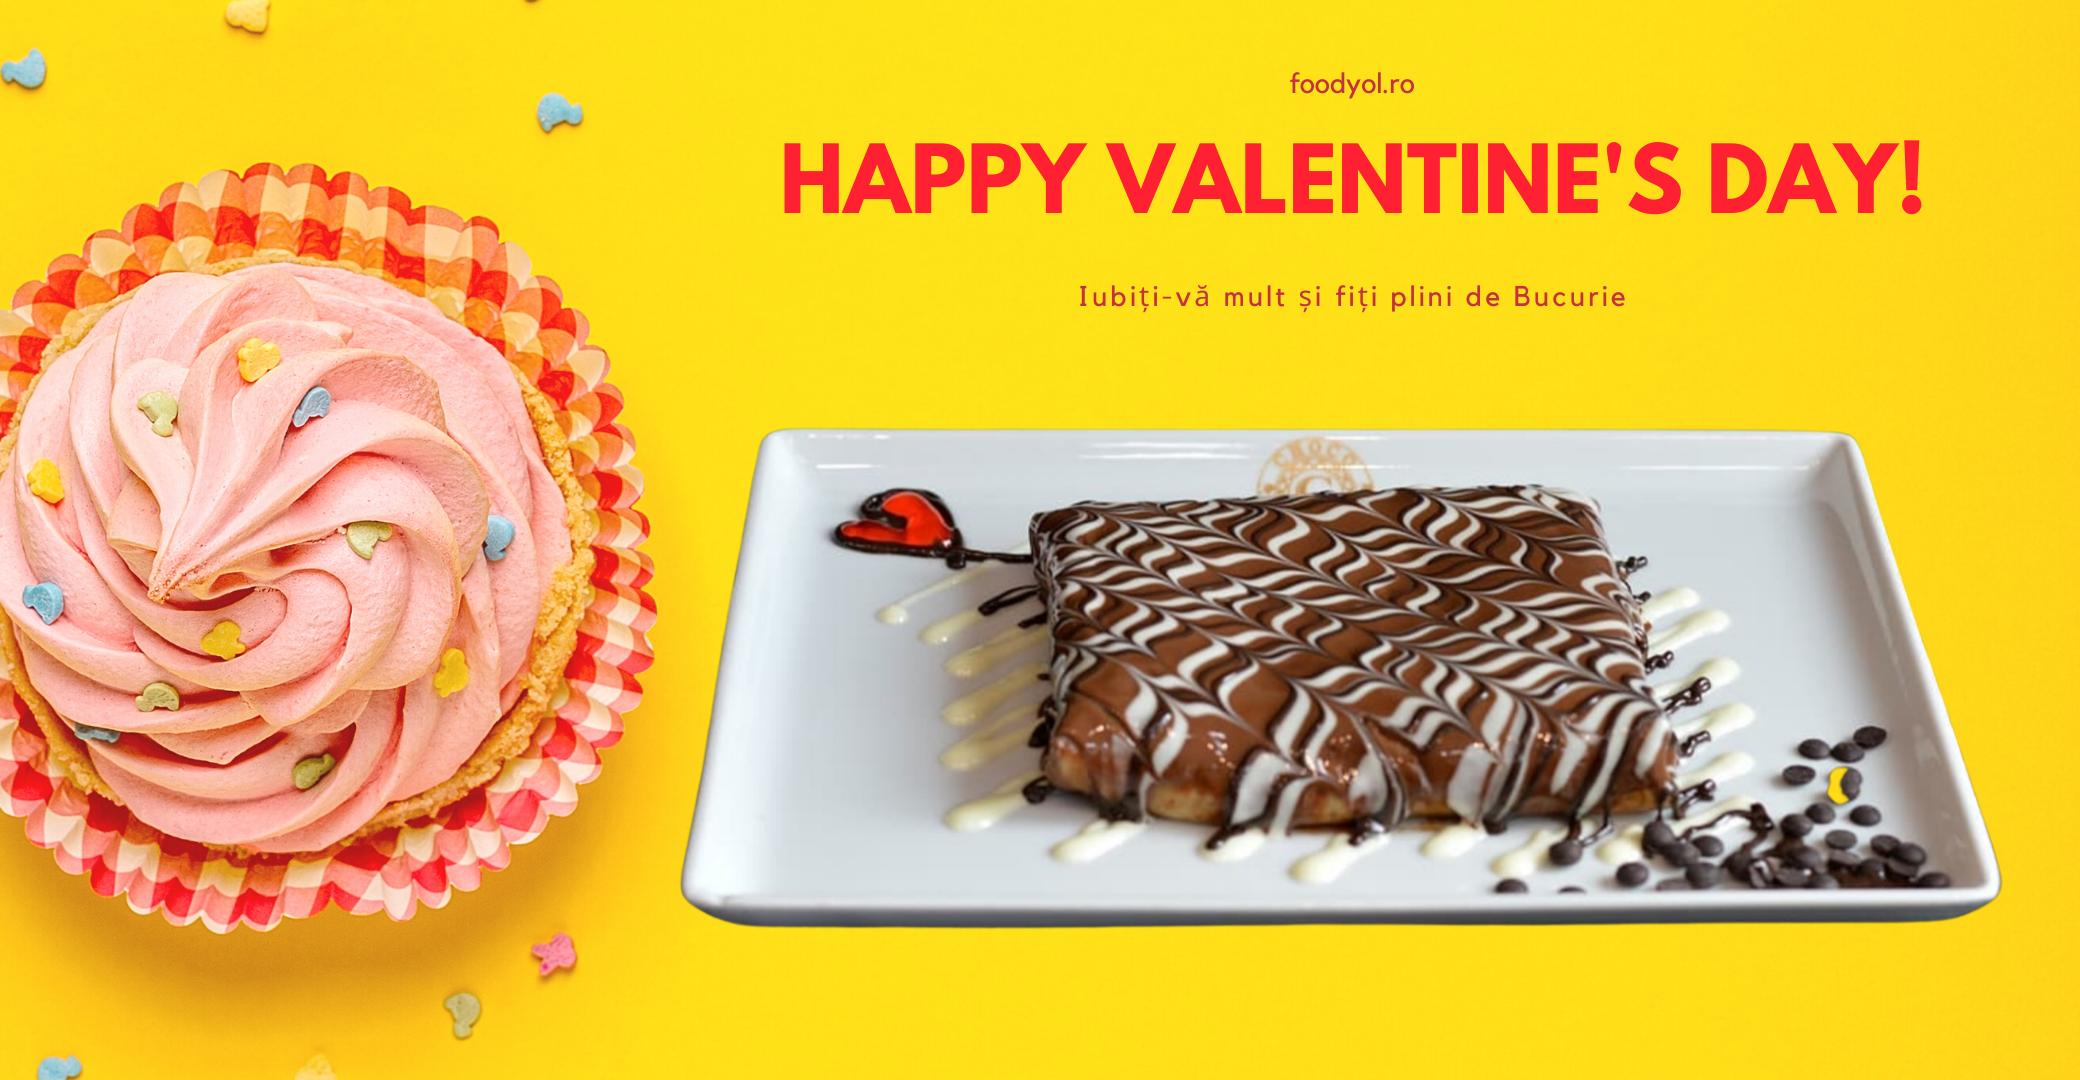 Deserturi de valentine's day!